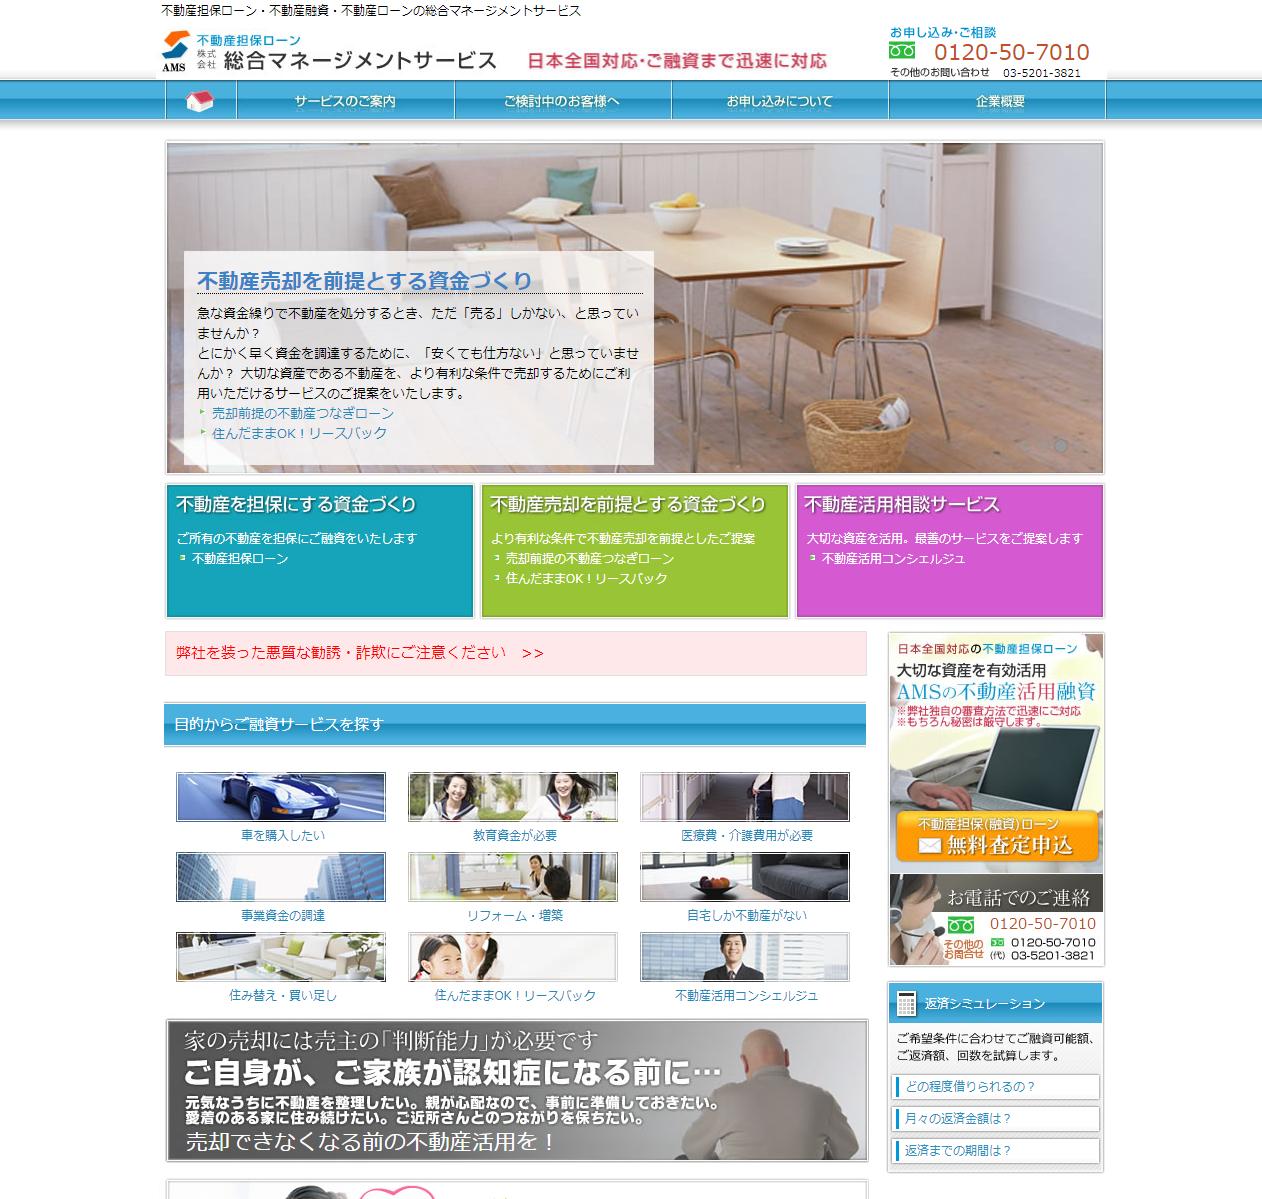 "<span class=""title"">株式会社総合マネジメントサービスの口コミや評判</span>"